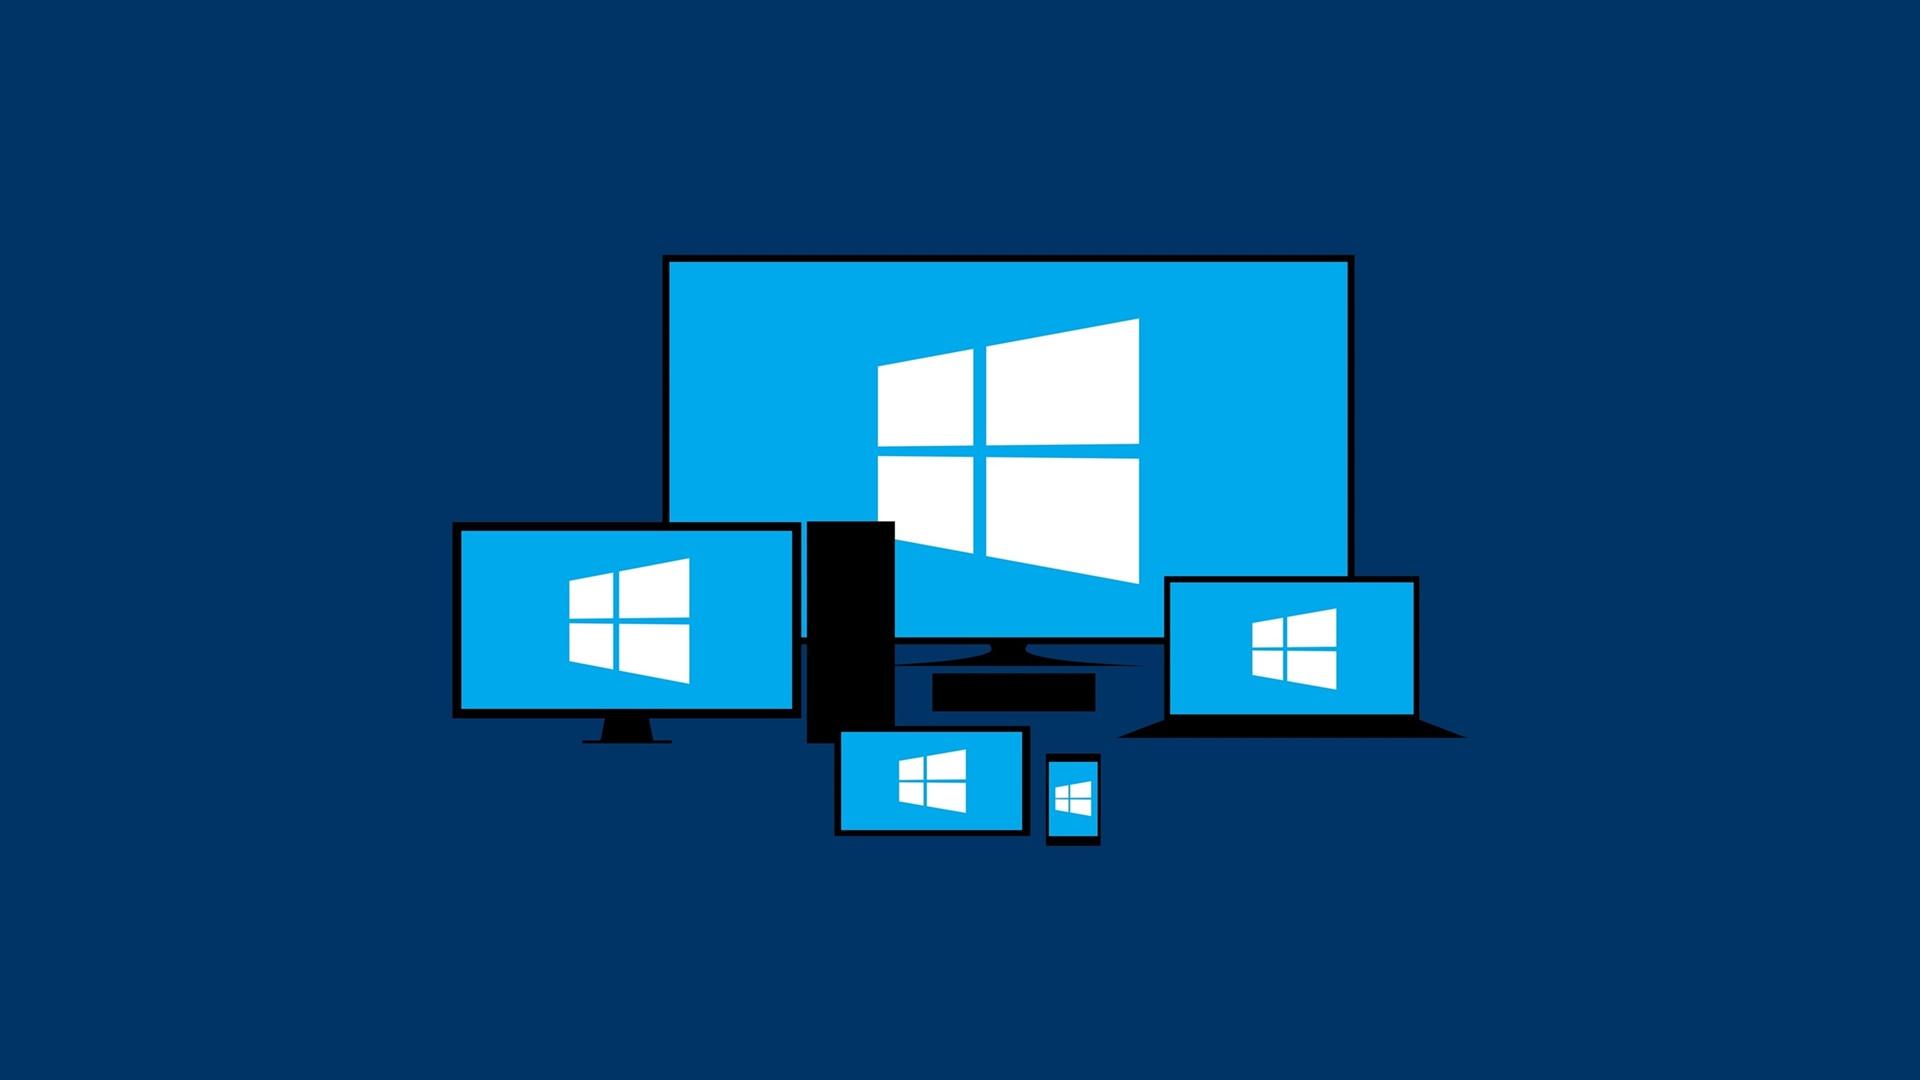 Microsoft Wants Devs to Port iOS Apps to Windows 10